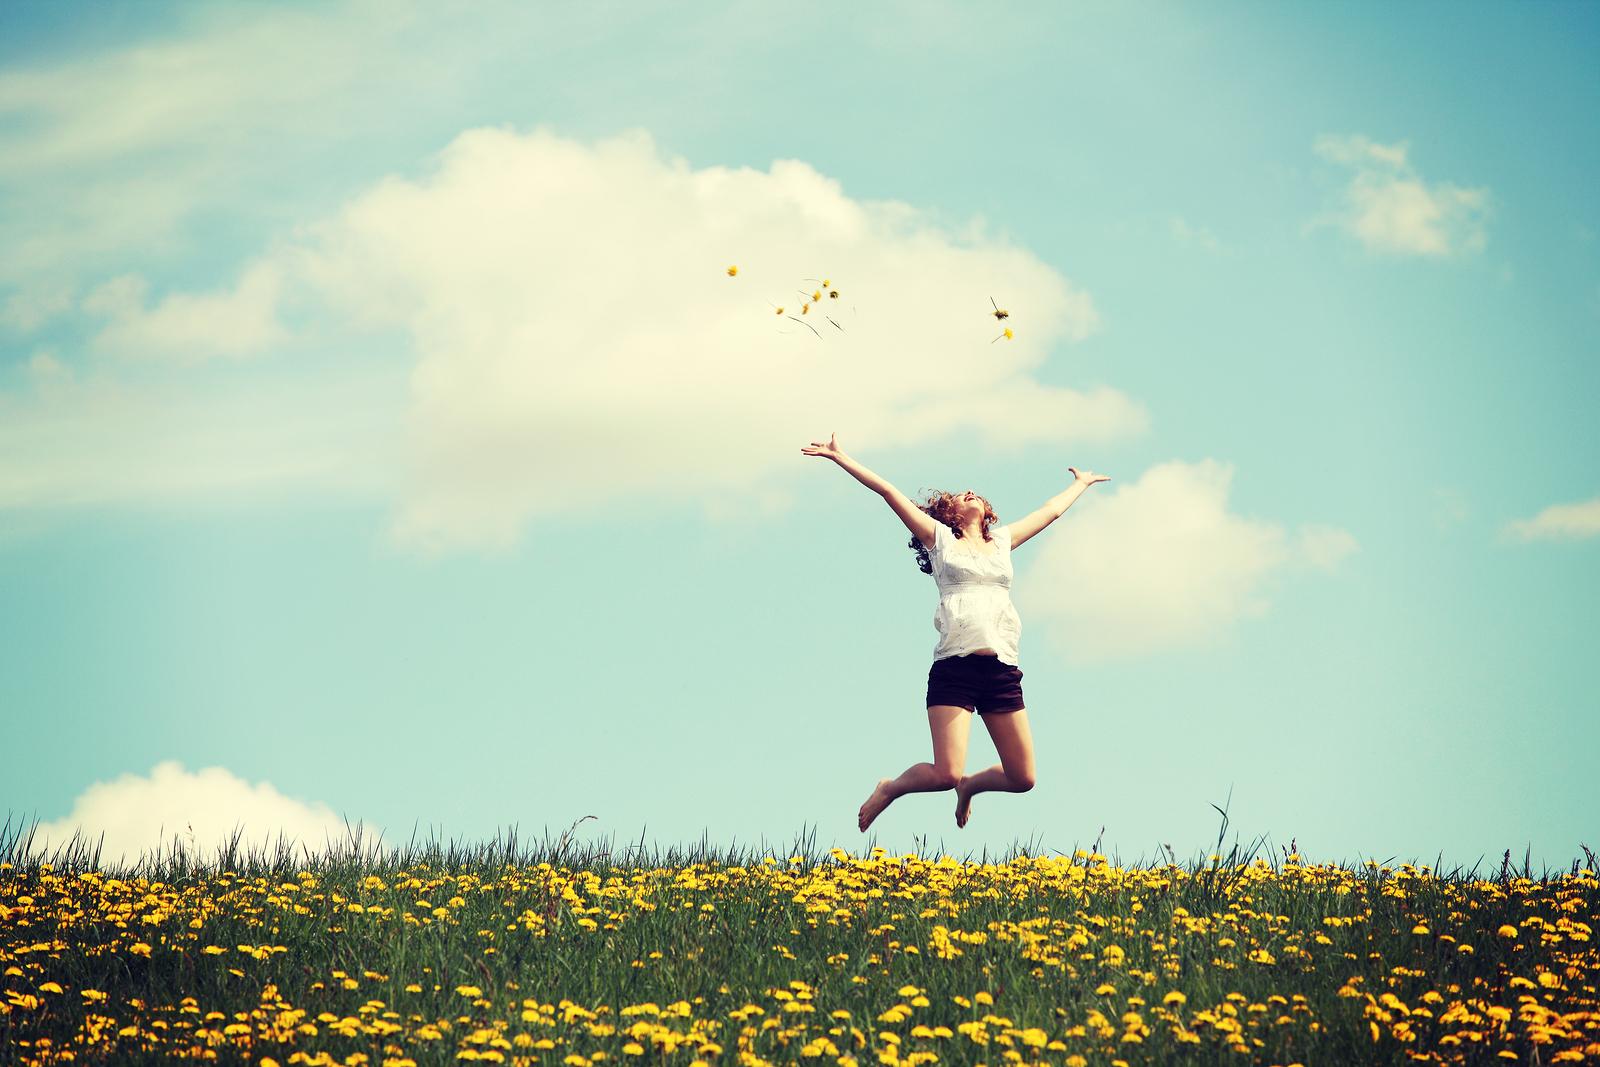 bigstock-Happy-woman-jumping-on-blossom-59295572.jpg